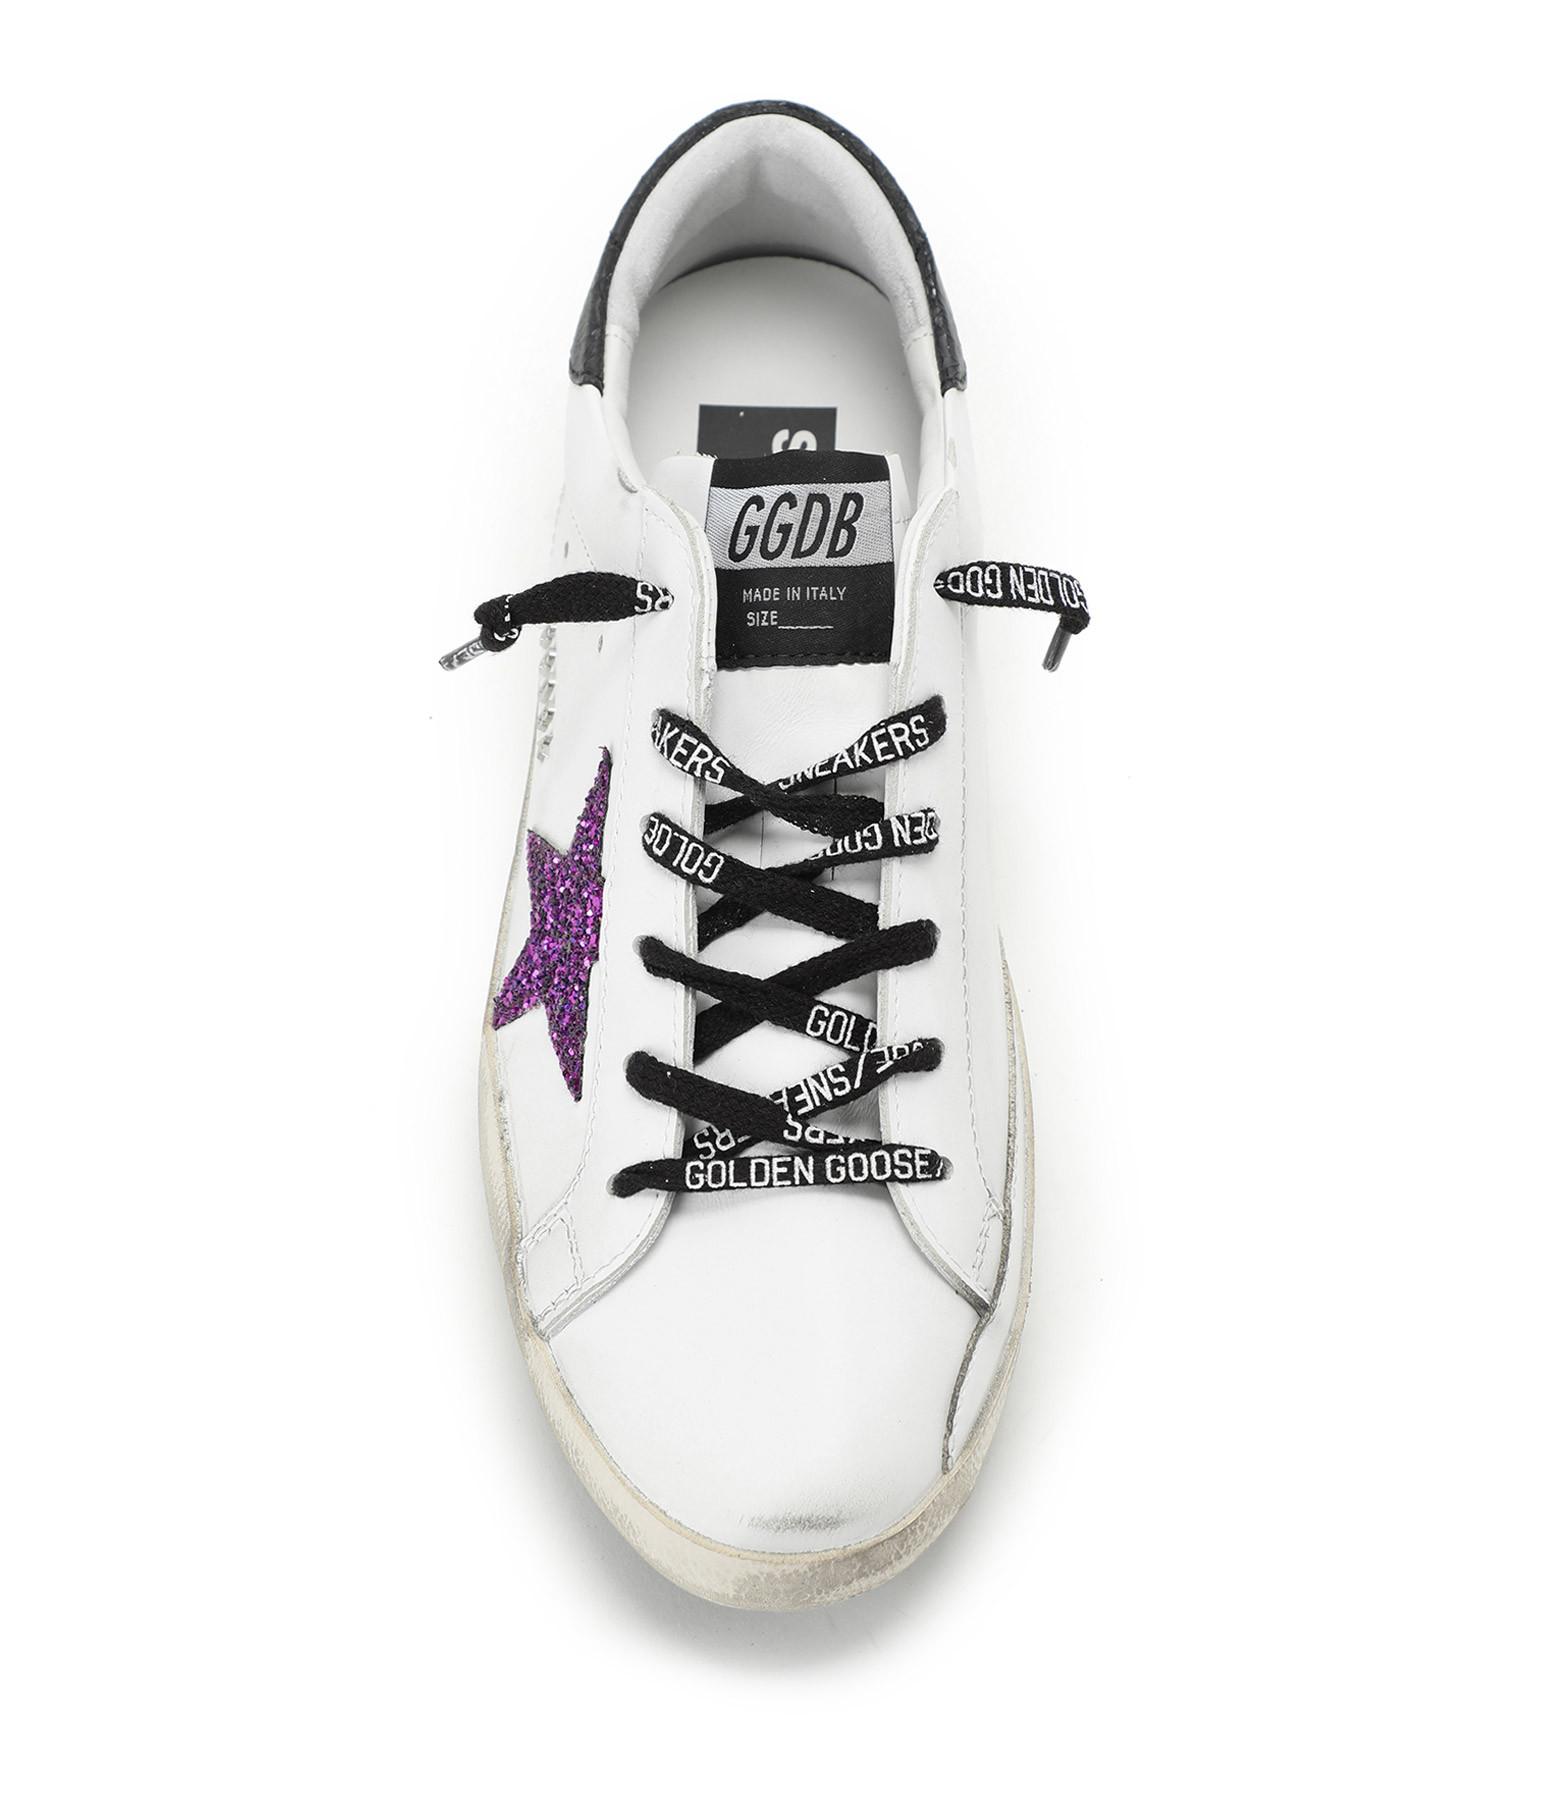 GOLDEN GOOSE - Baskets Superstar Cuir Glitter Violet Noir